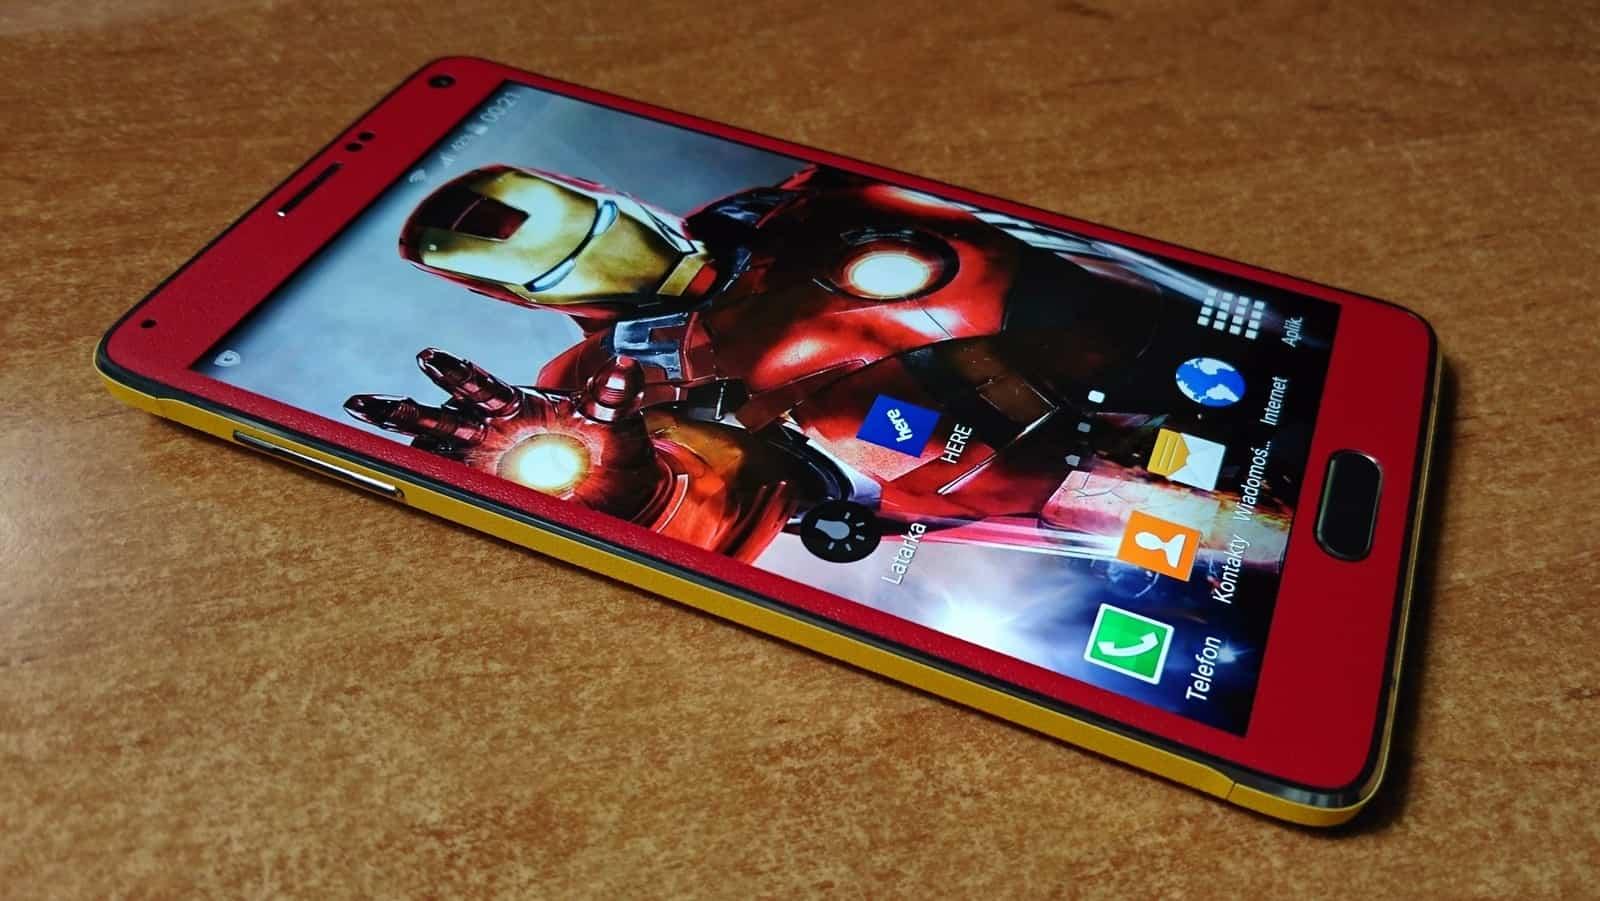 DIY-Note-4-Iron-Man-edition(1) KK